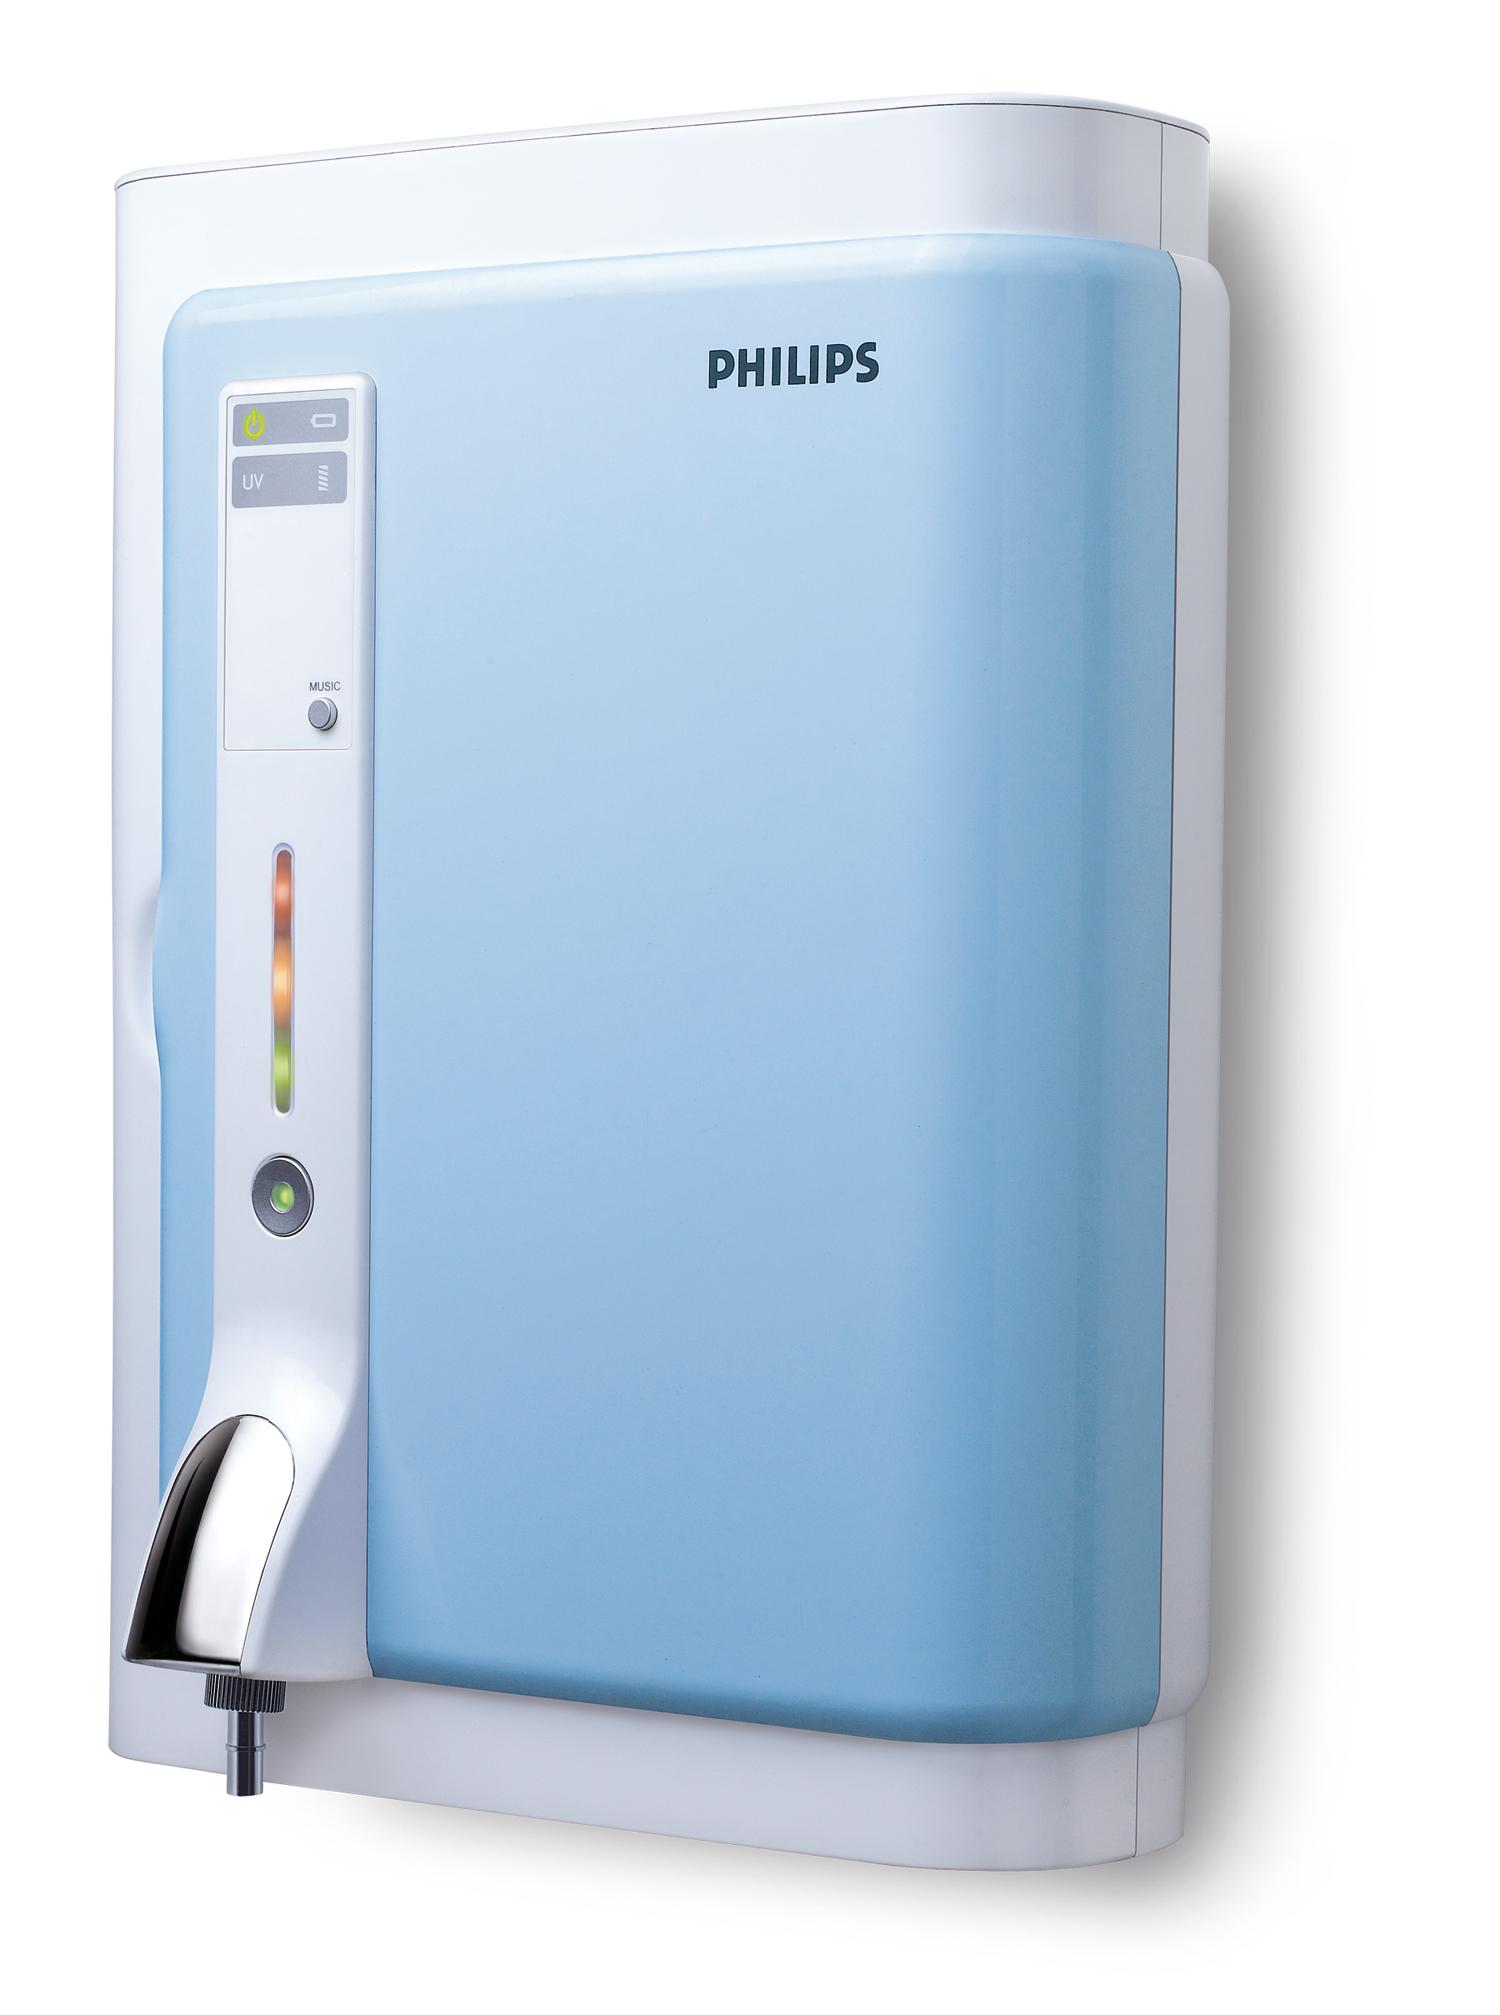 Philips WP 3889 UV Water Purifier Image